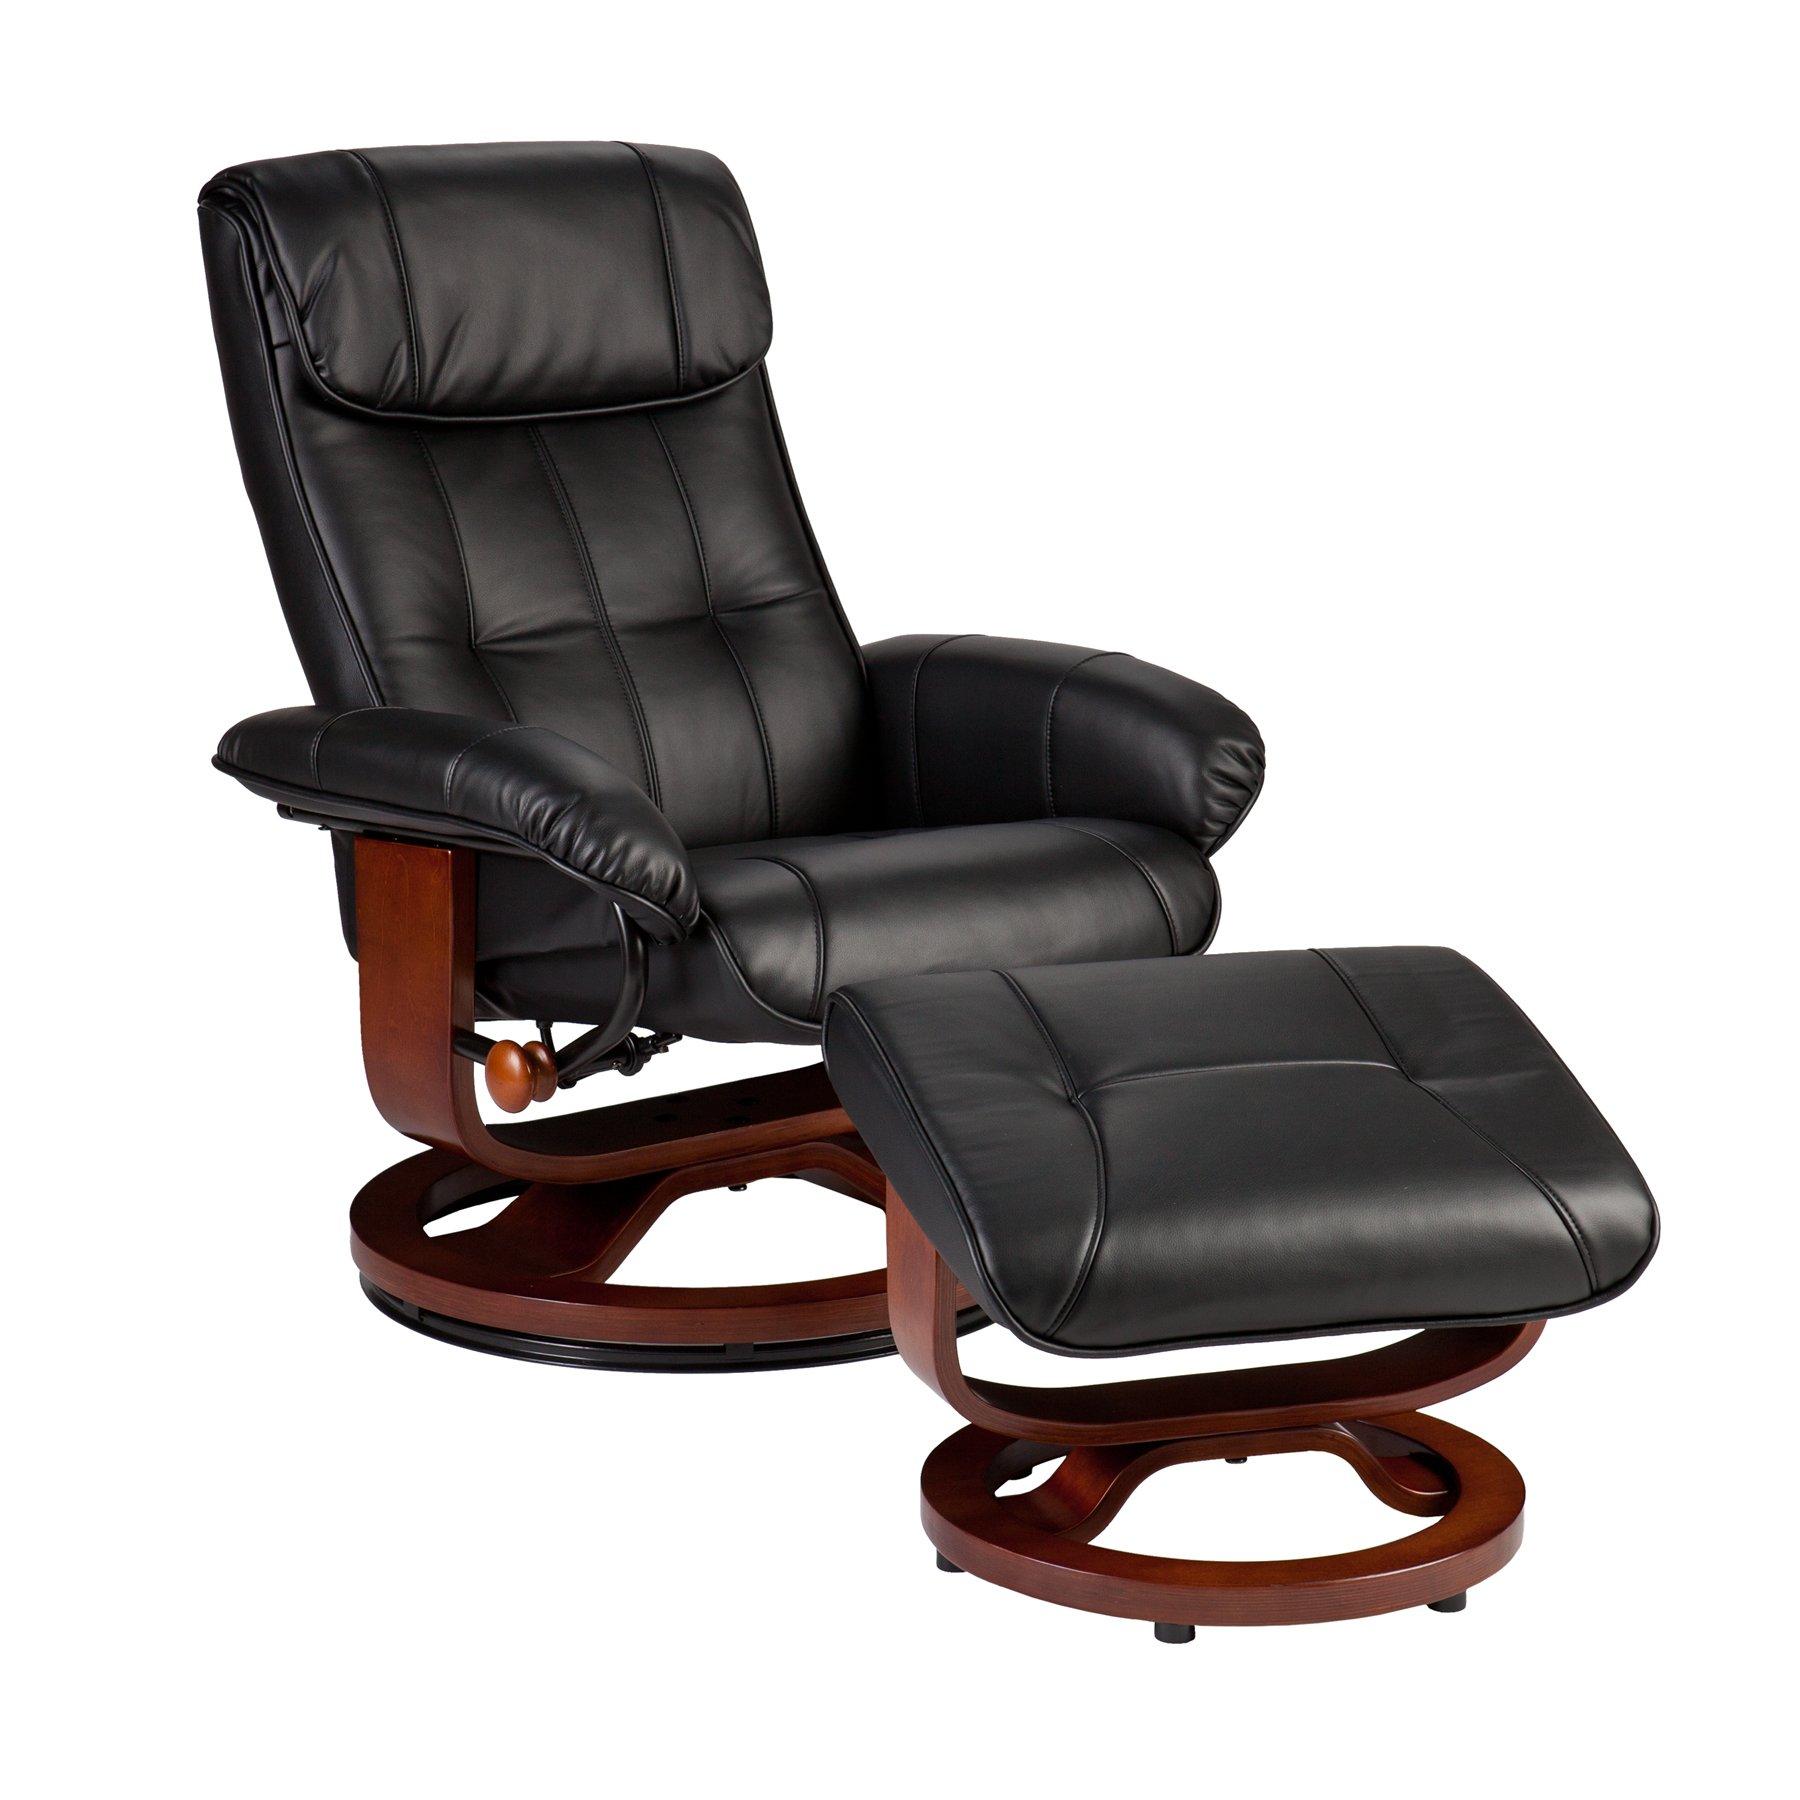 recliner vs chair with ottoman outdoor rocking set sei u base donavan and black bonded